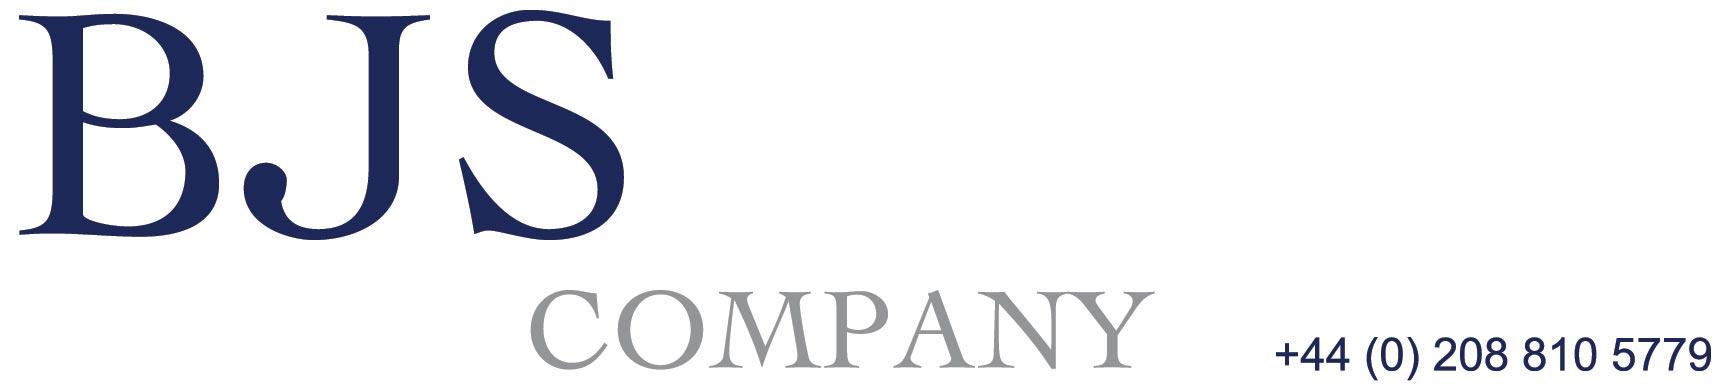 BJS Company Ltd - BJS Group Electroplating, Silversmithing, Electroforms